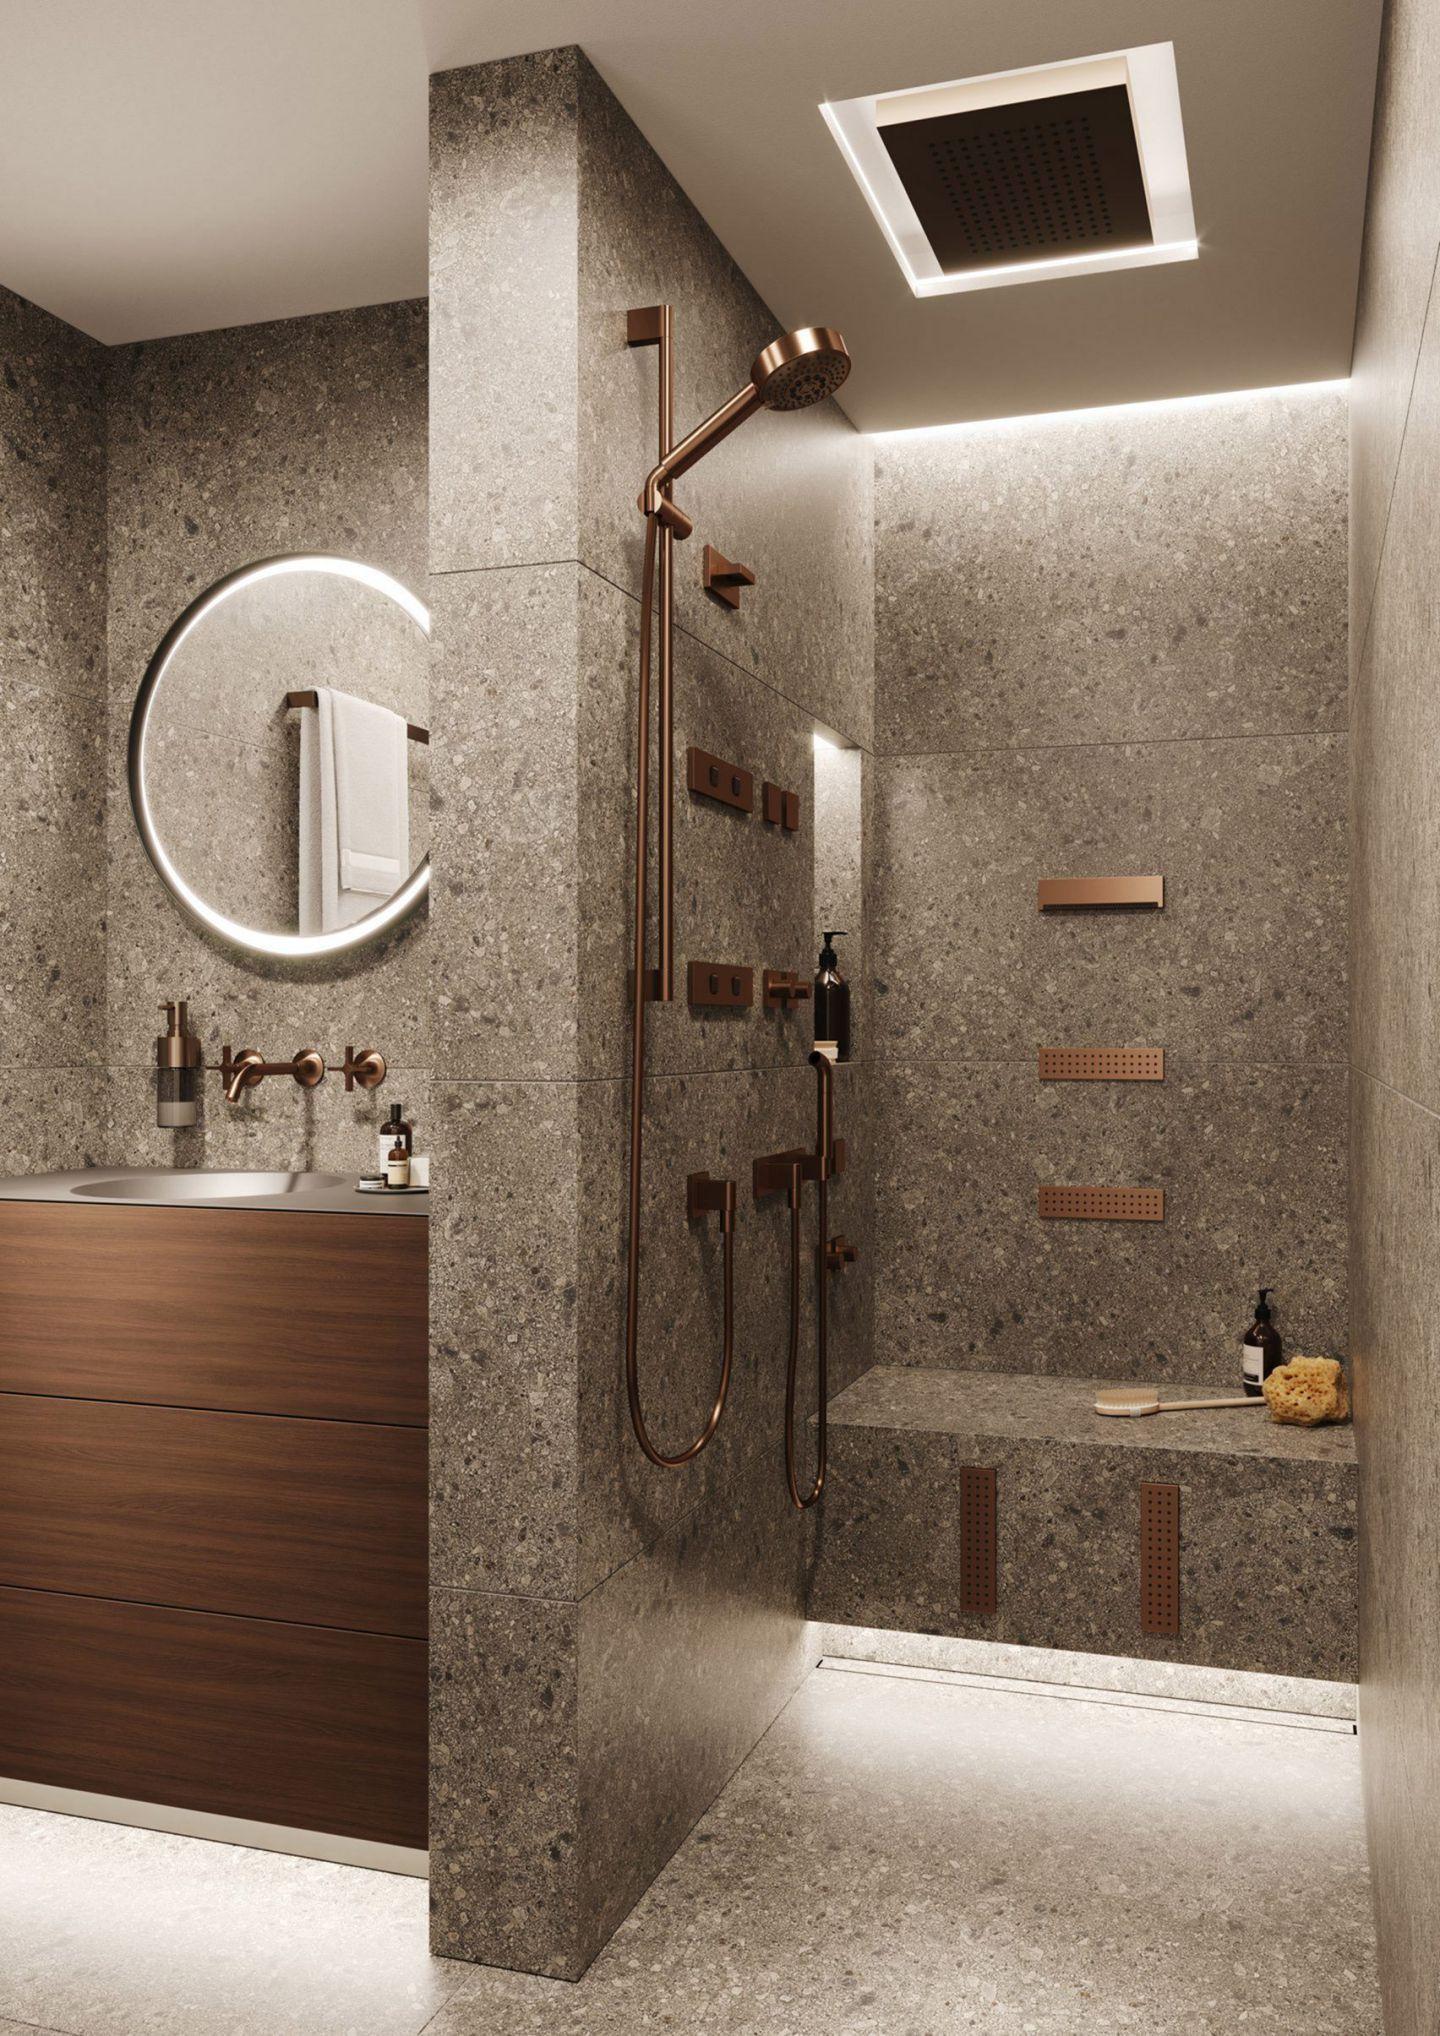 30 Fabulous Small Bathroom Ideas For Your Apartment Washroom Design Bathroom Design Small Bathroom Interior